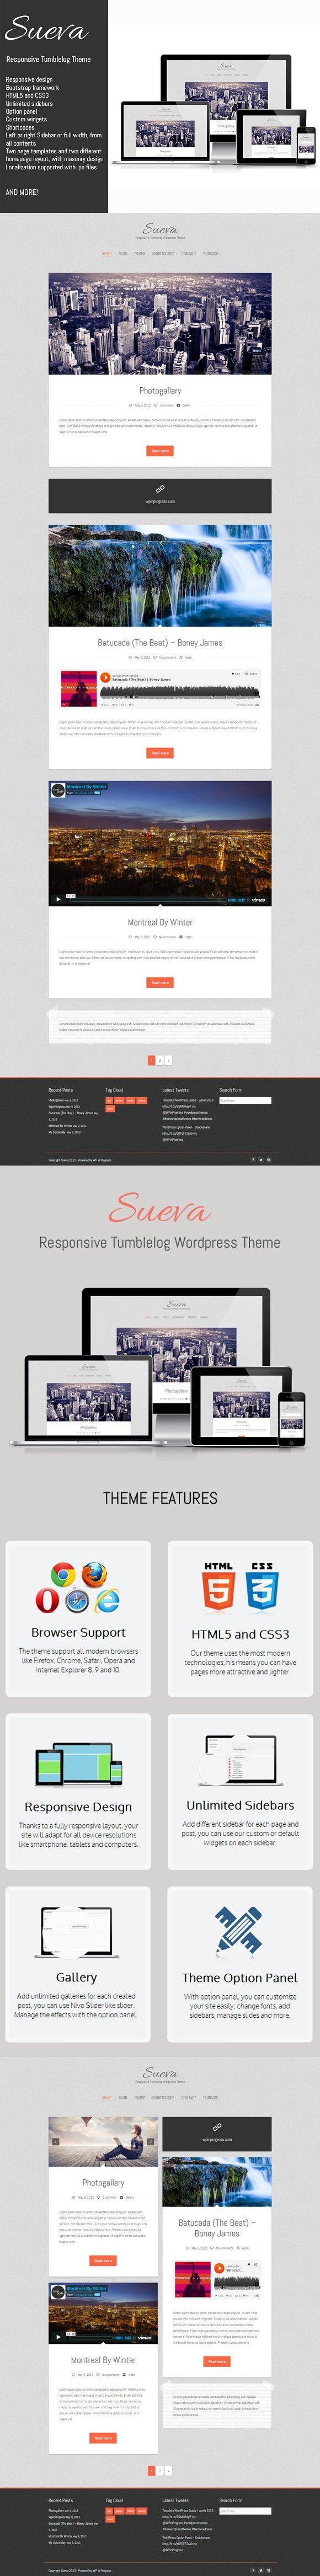 93 best WordPress Blog Themes images on Pinterest   Wordpress blog ...